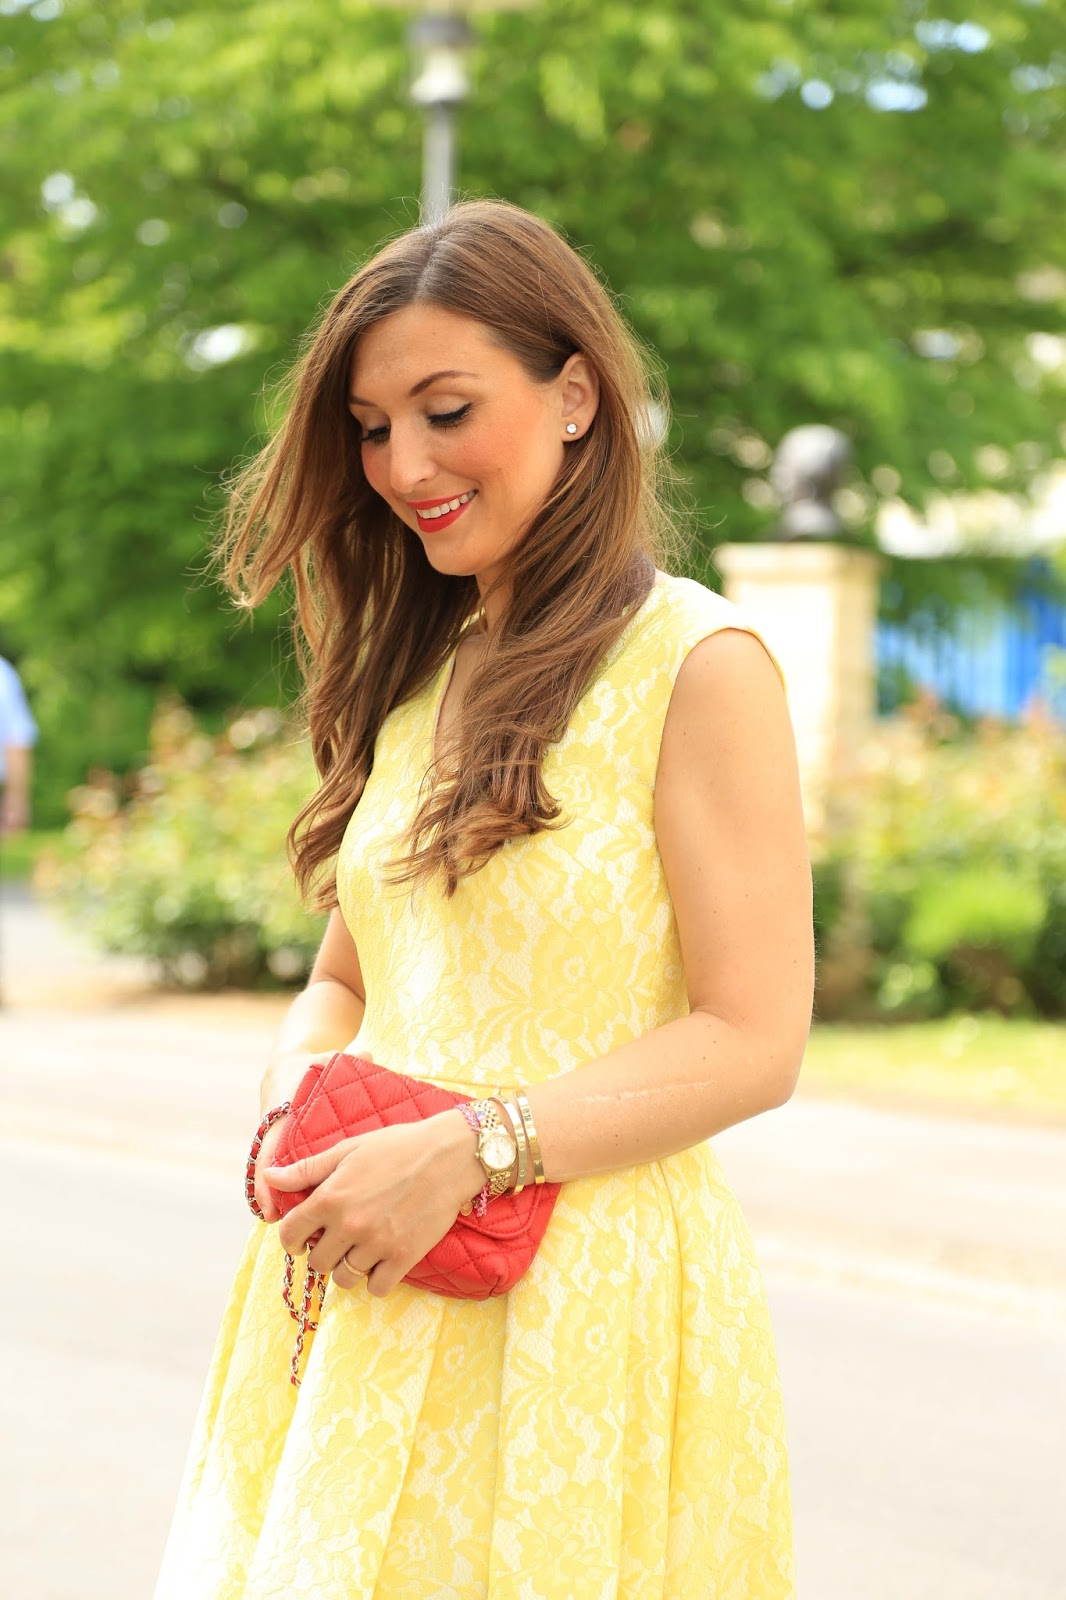 Fashionstylebyjohanna im Kleid  -Fashionstylebyjohanna - Streifenkleid - Weiß blau gestreiftes Kleid- Rote Schuhe - Fashionblogger aus Frankfurt - Frankfurt Fashionblogger